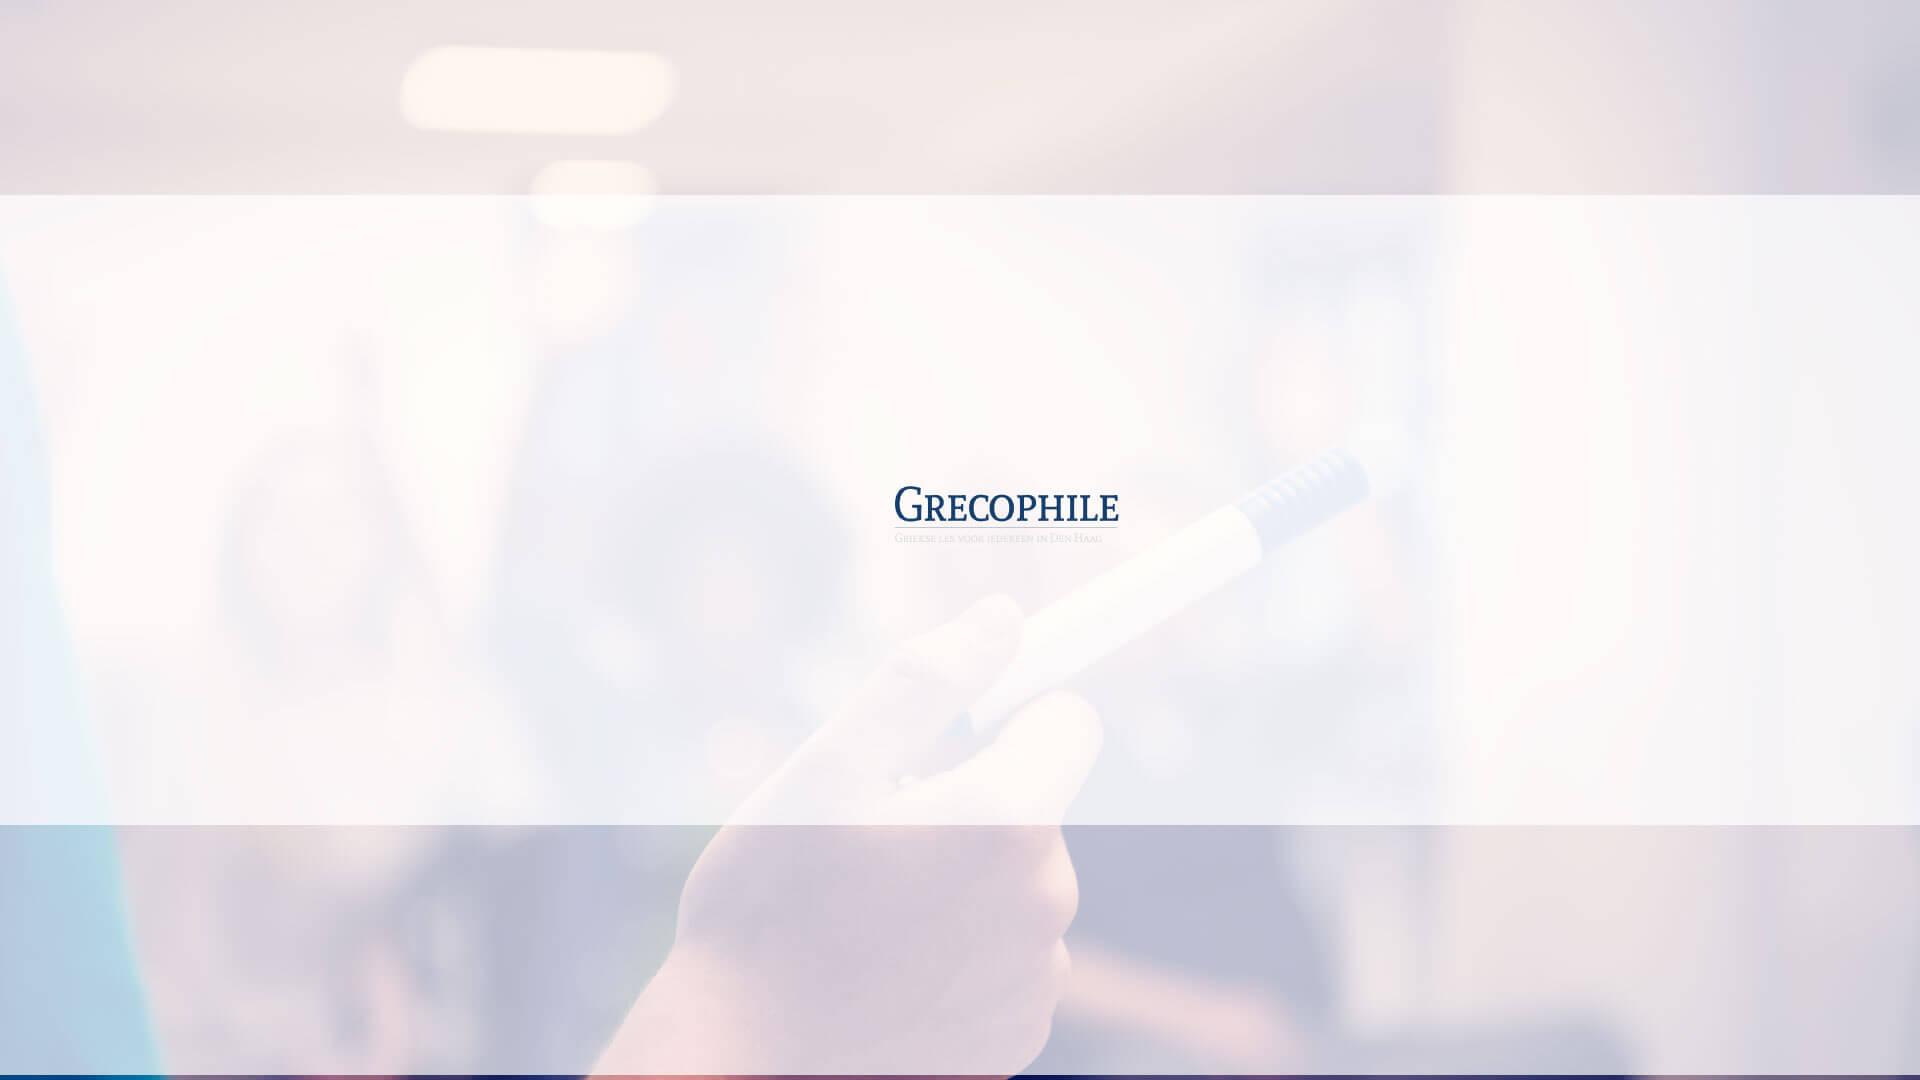 Grecophile